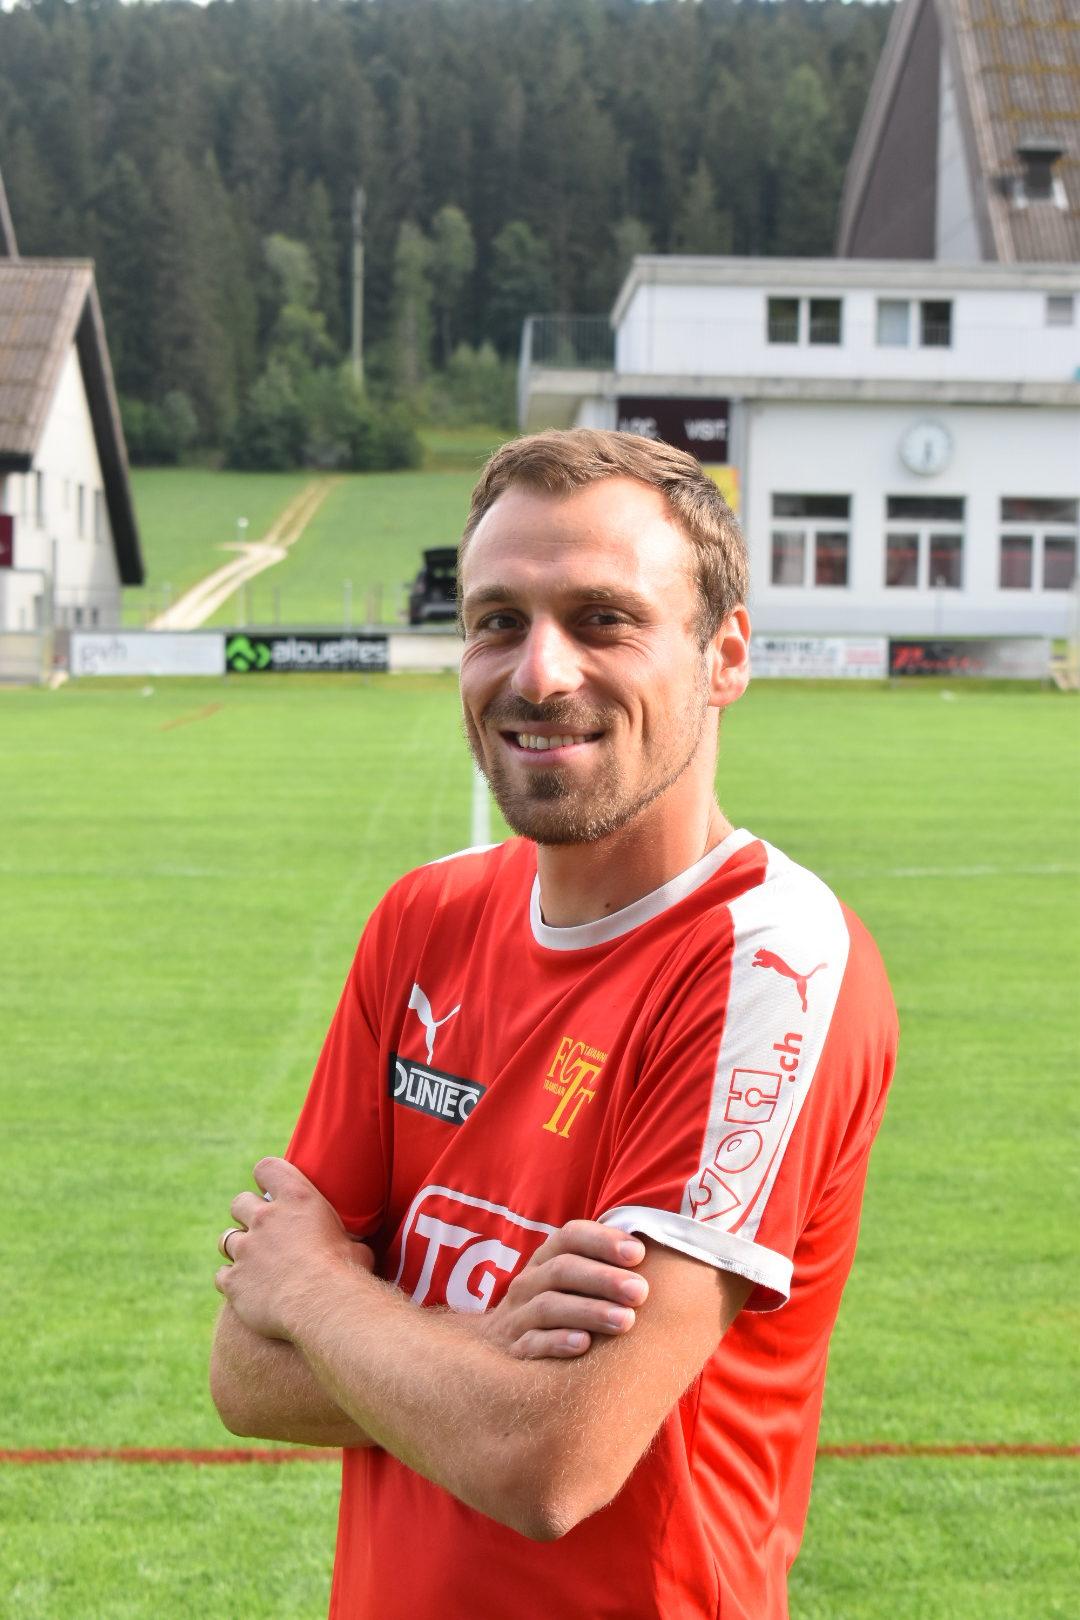 Gaetan Habegger